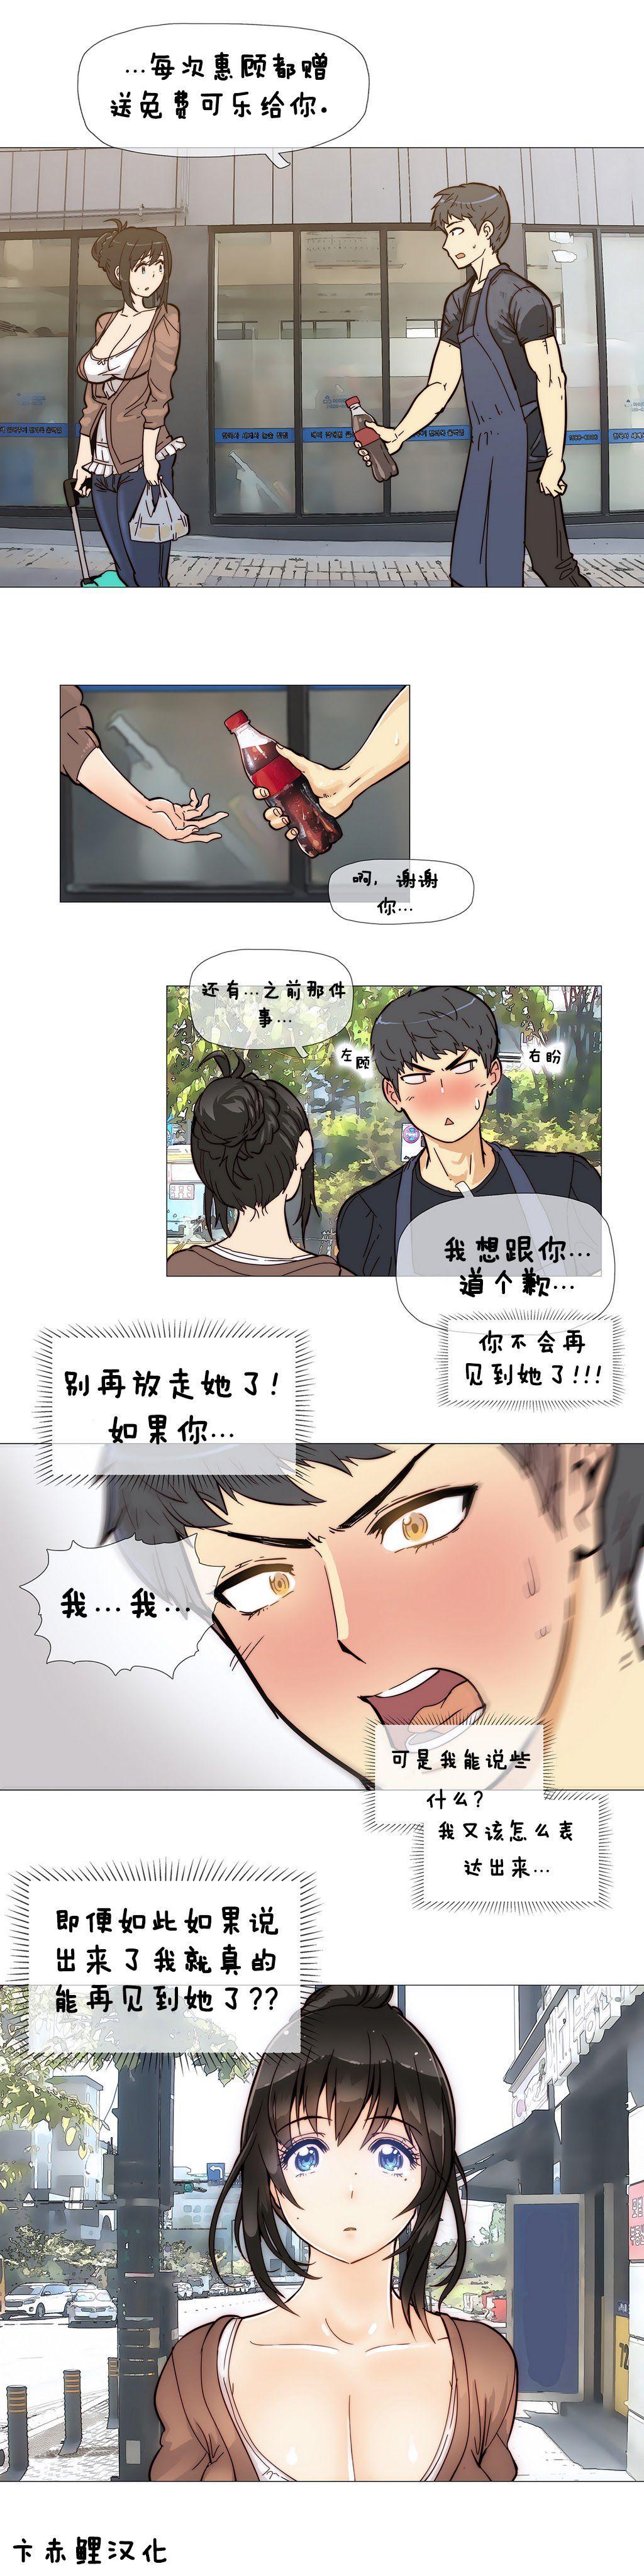 HouseHold Affairs 【卞赤鲤个人汉化】1~33话(持续更新中) 78